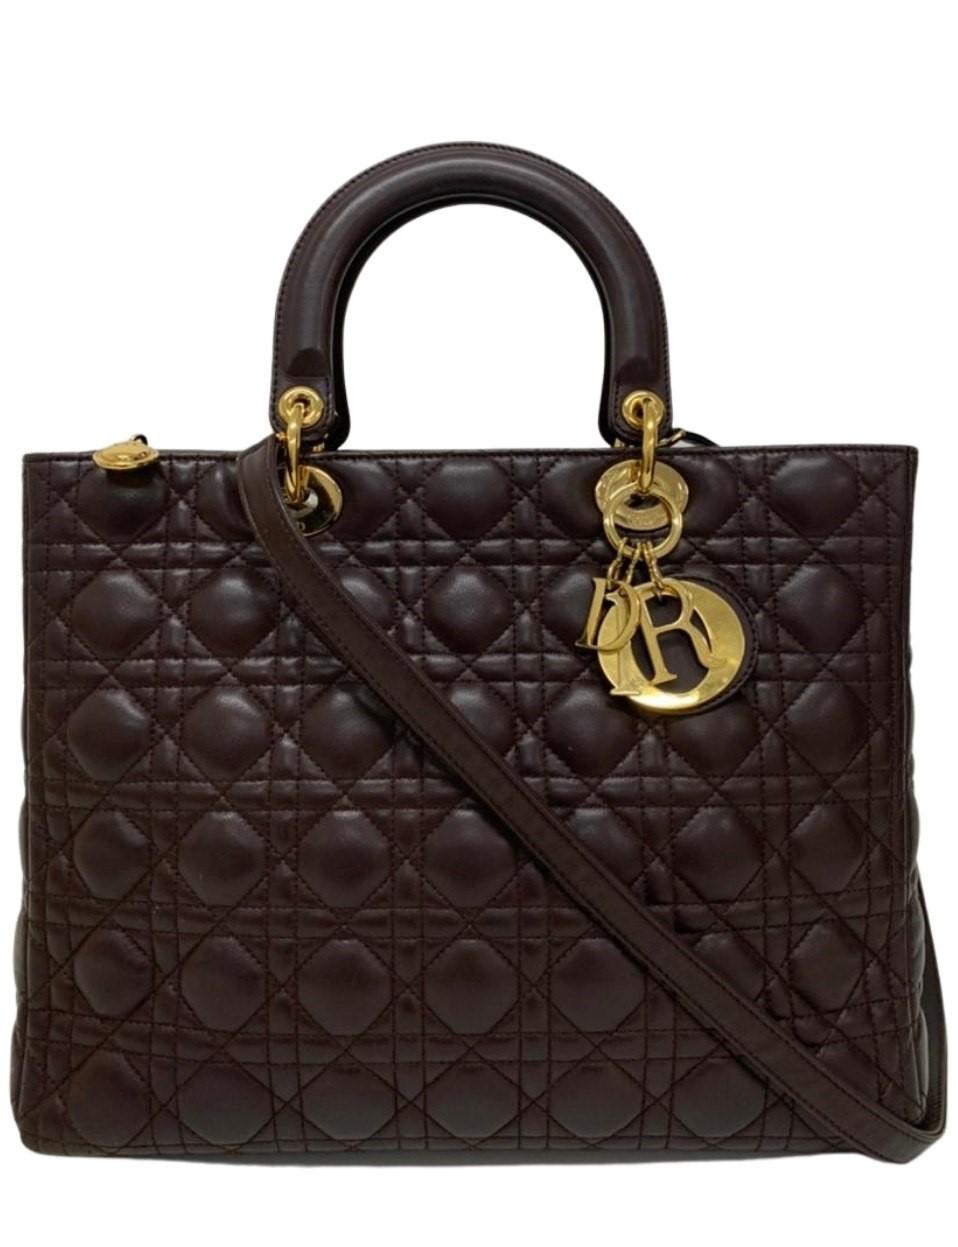 Bolsa Dior 'Lady Dior' Cannage Quilted